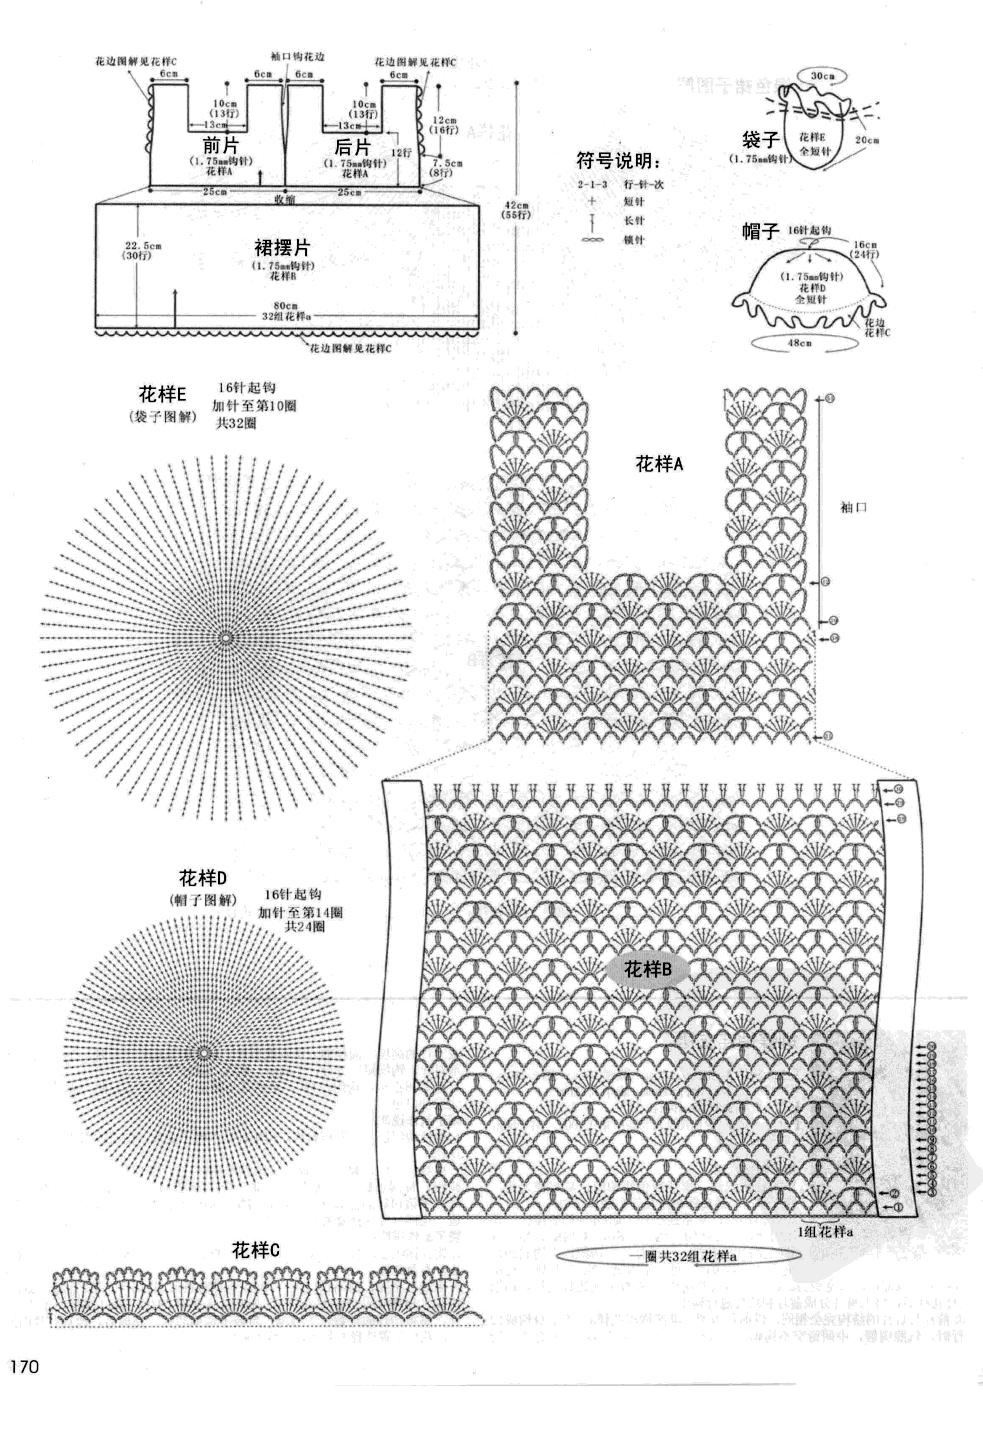 p (170).jpg